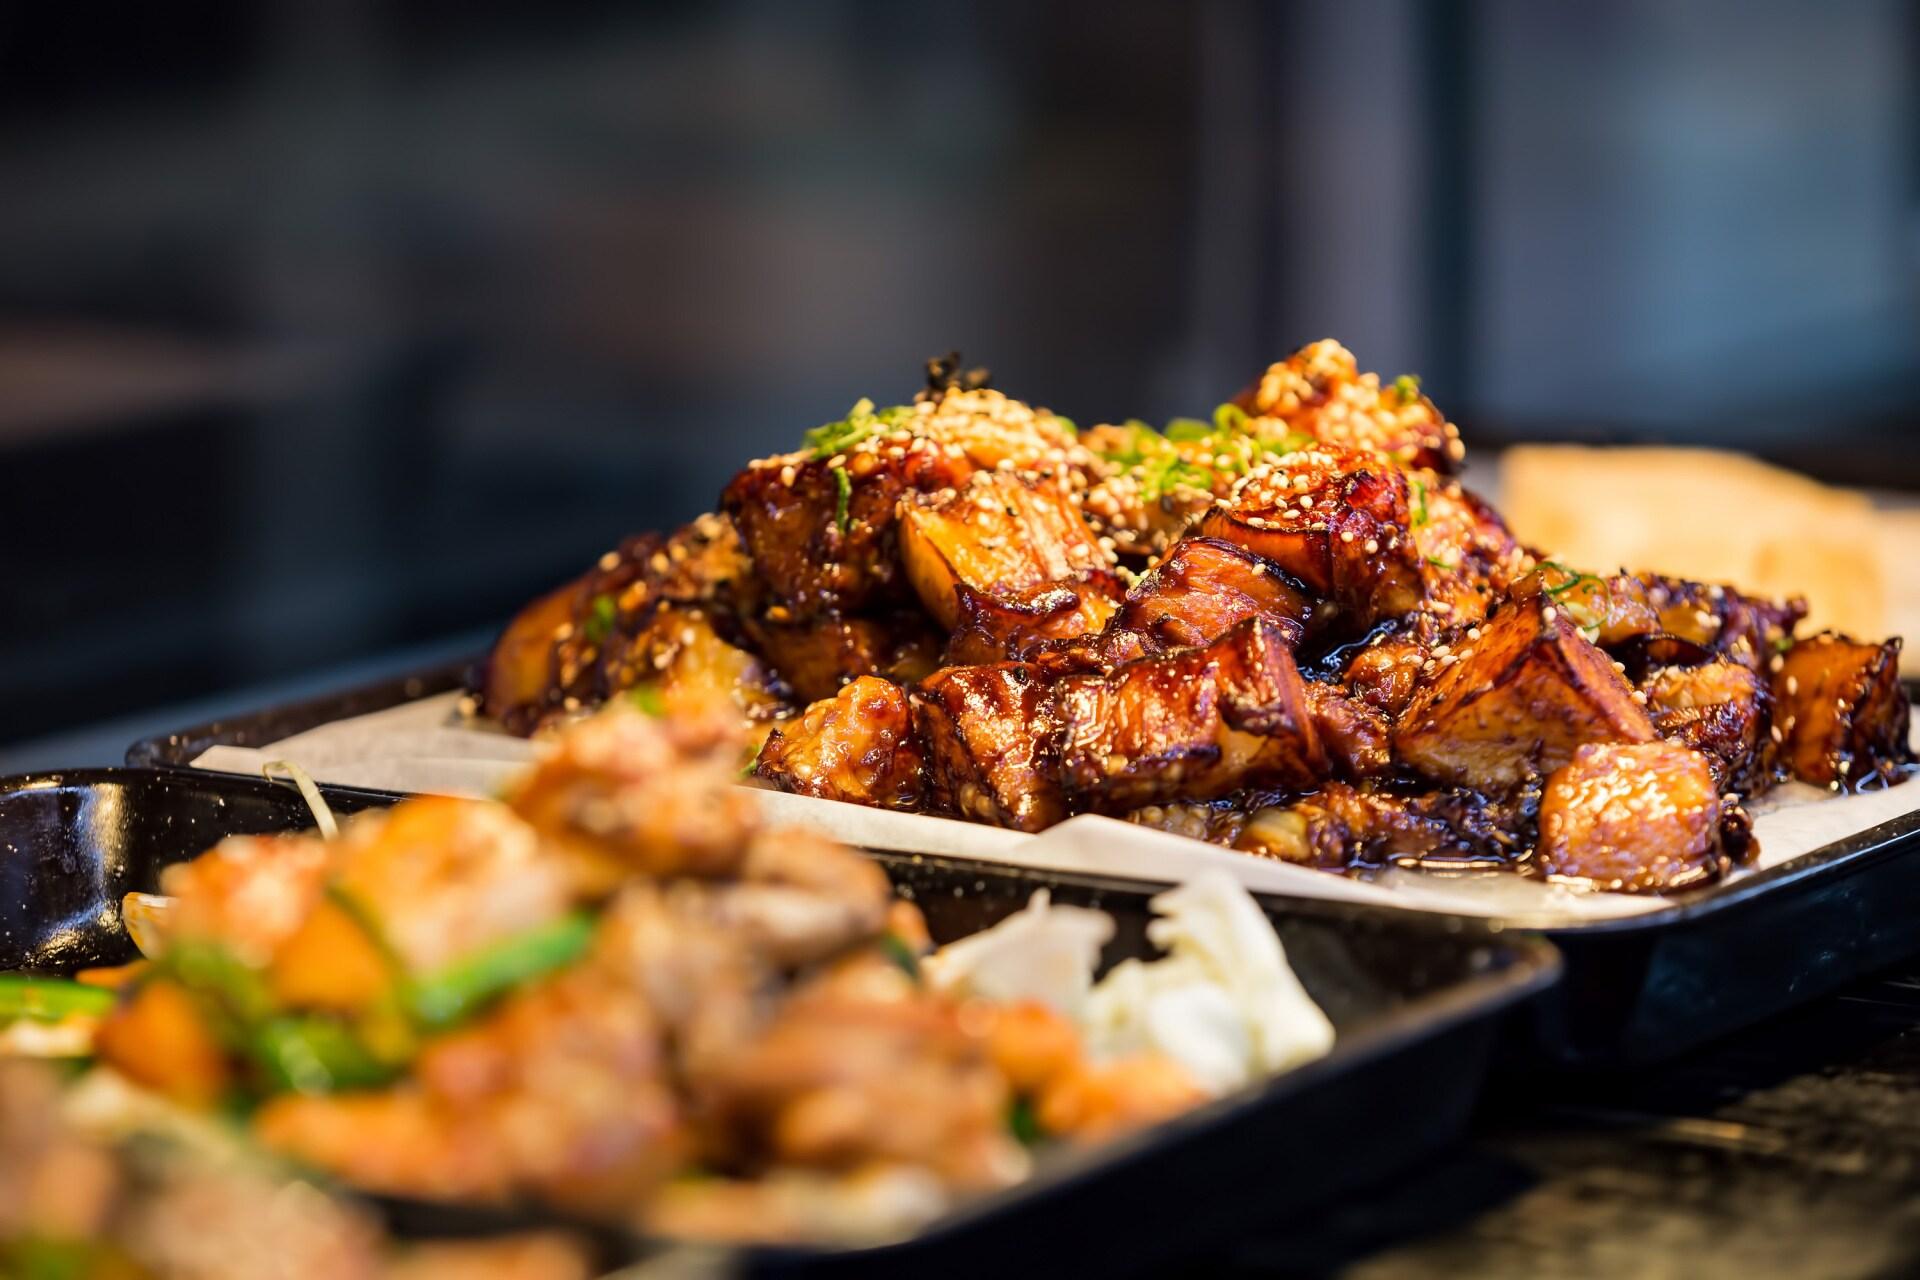 Recipe: a decadent Japanese-inspired roasted eggplant dish